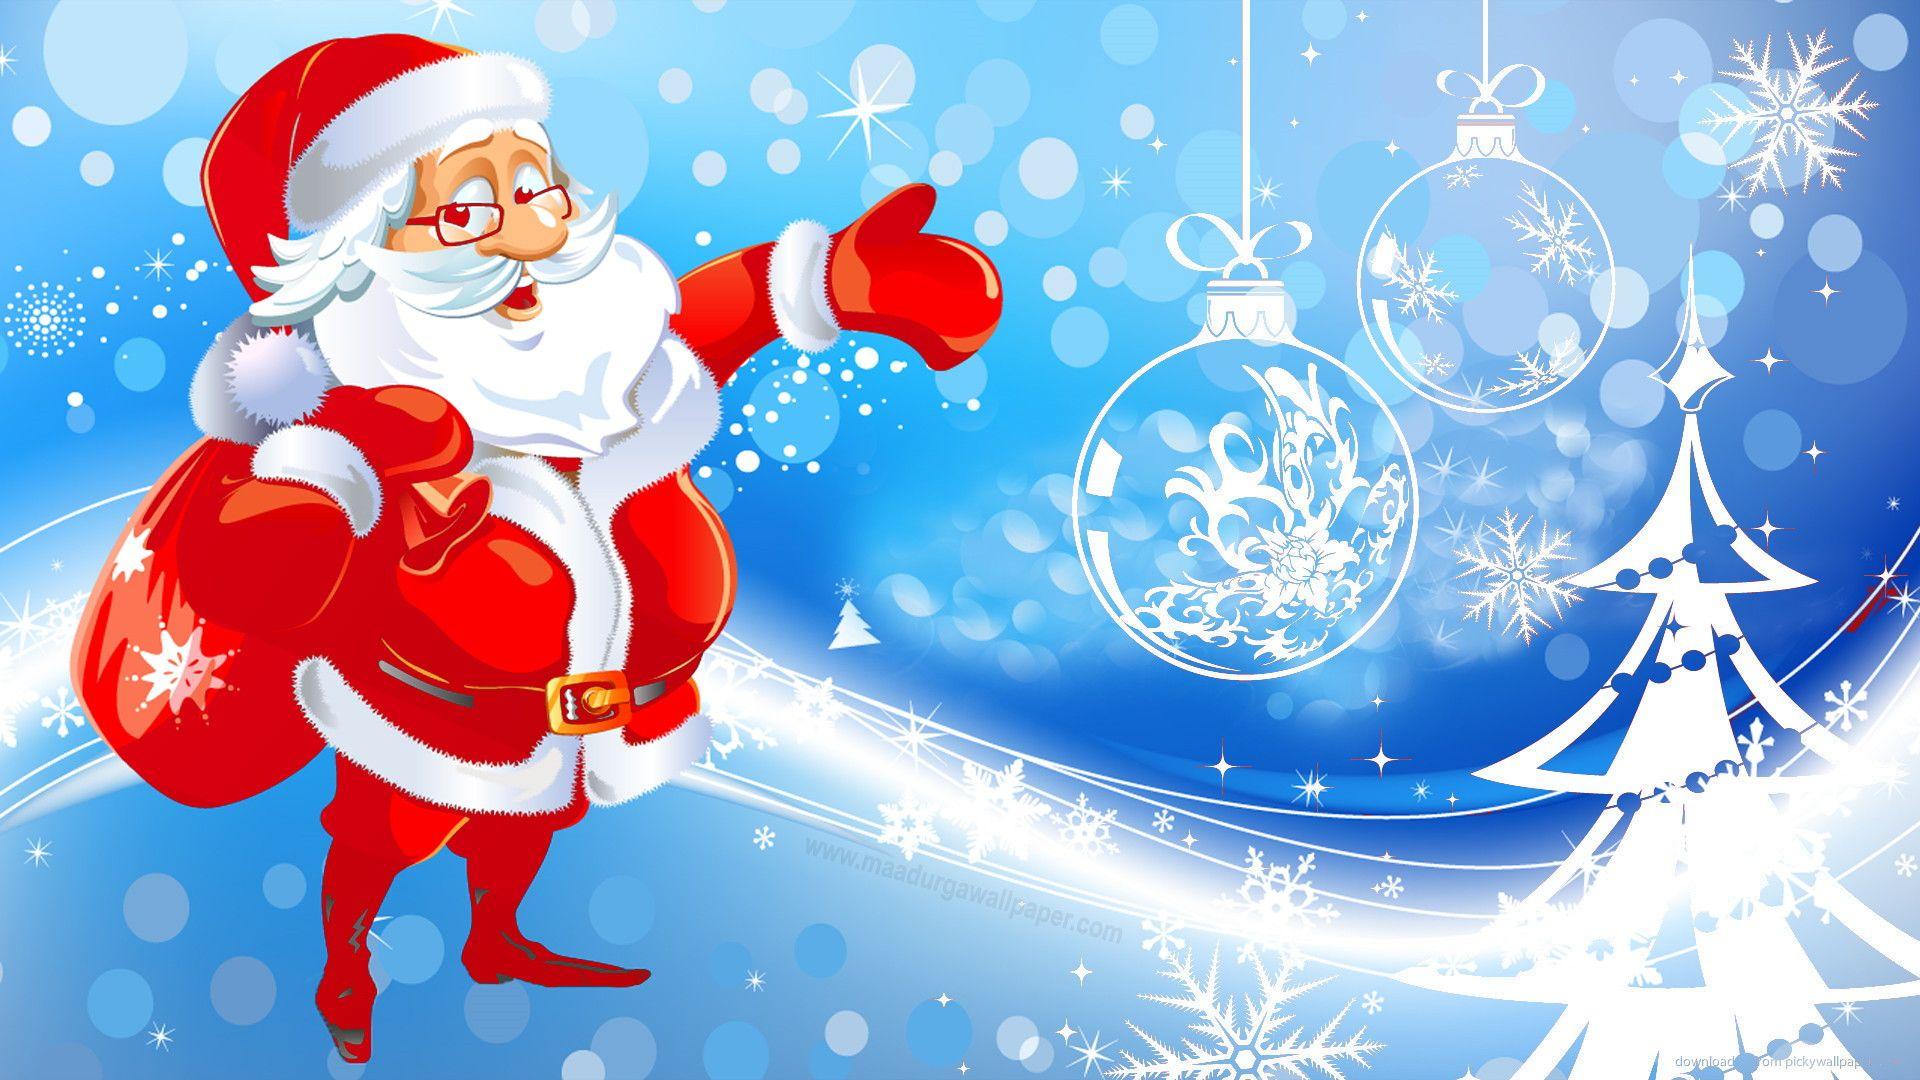 Santa Claus wallpaper photo full hd